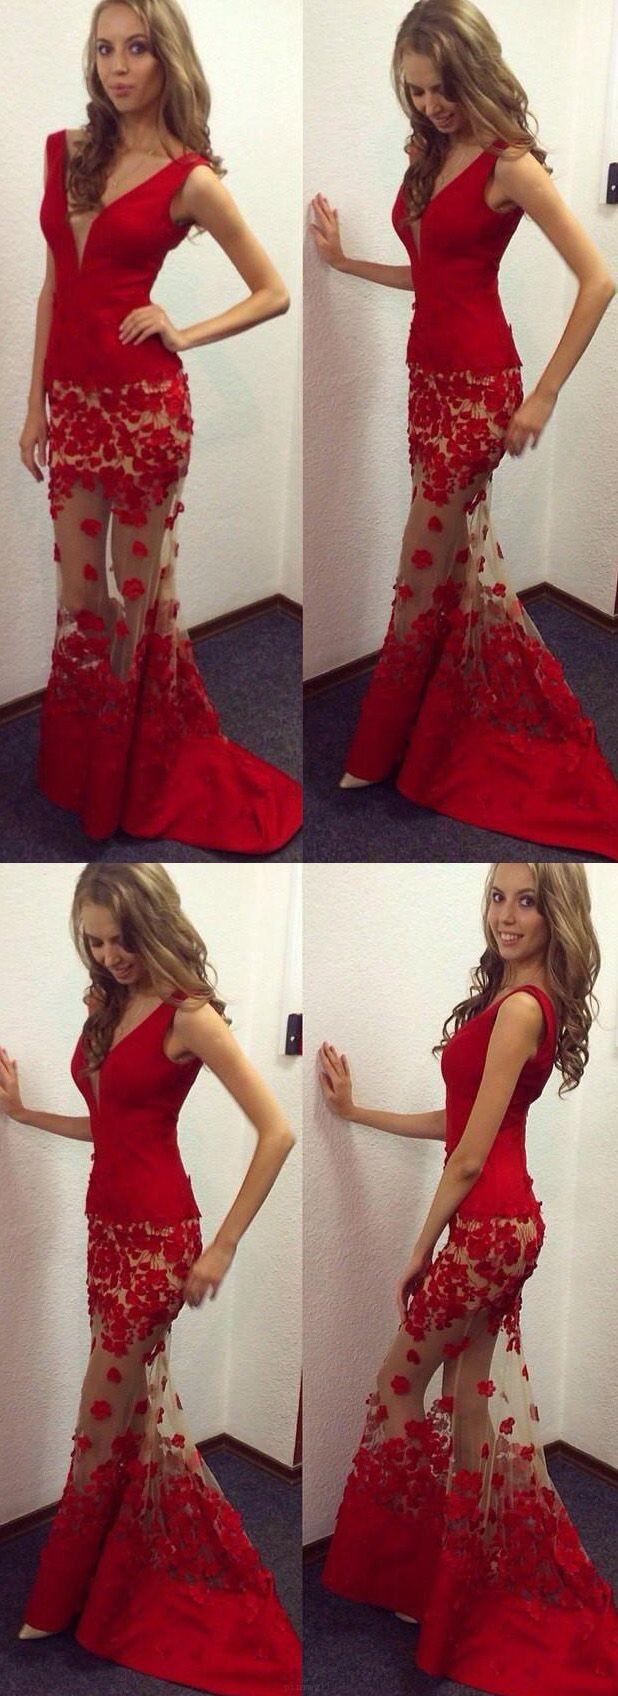 Red Prom Dresses, Long Prom Dresses, Backless Prom Dresses, Prom Dresses On Sale, Long Red Prom Dresses, Illusion Prom Dresses, Prom Dresses Red, Prom Long Dresses, Long Evening Dresses, Long Red dresses, Dresses On Sale, Red Long dresses, Sweep Train Prom Dresses